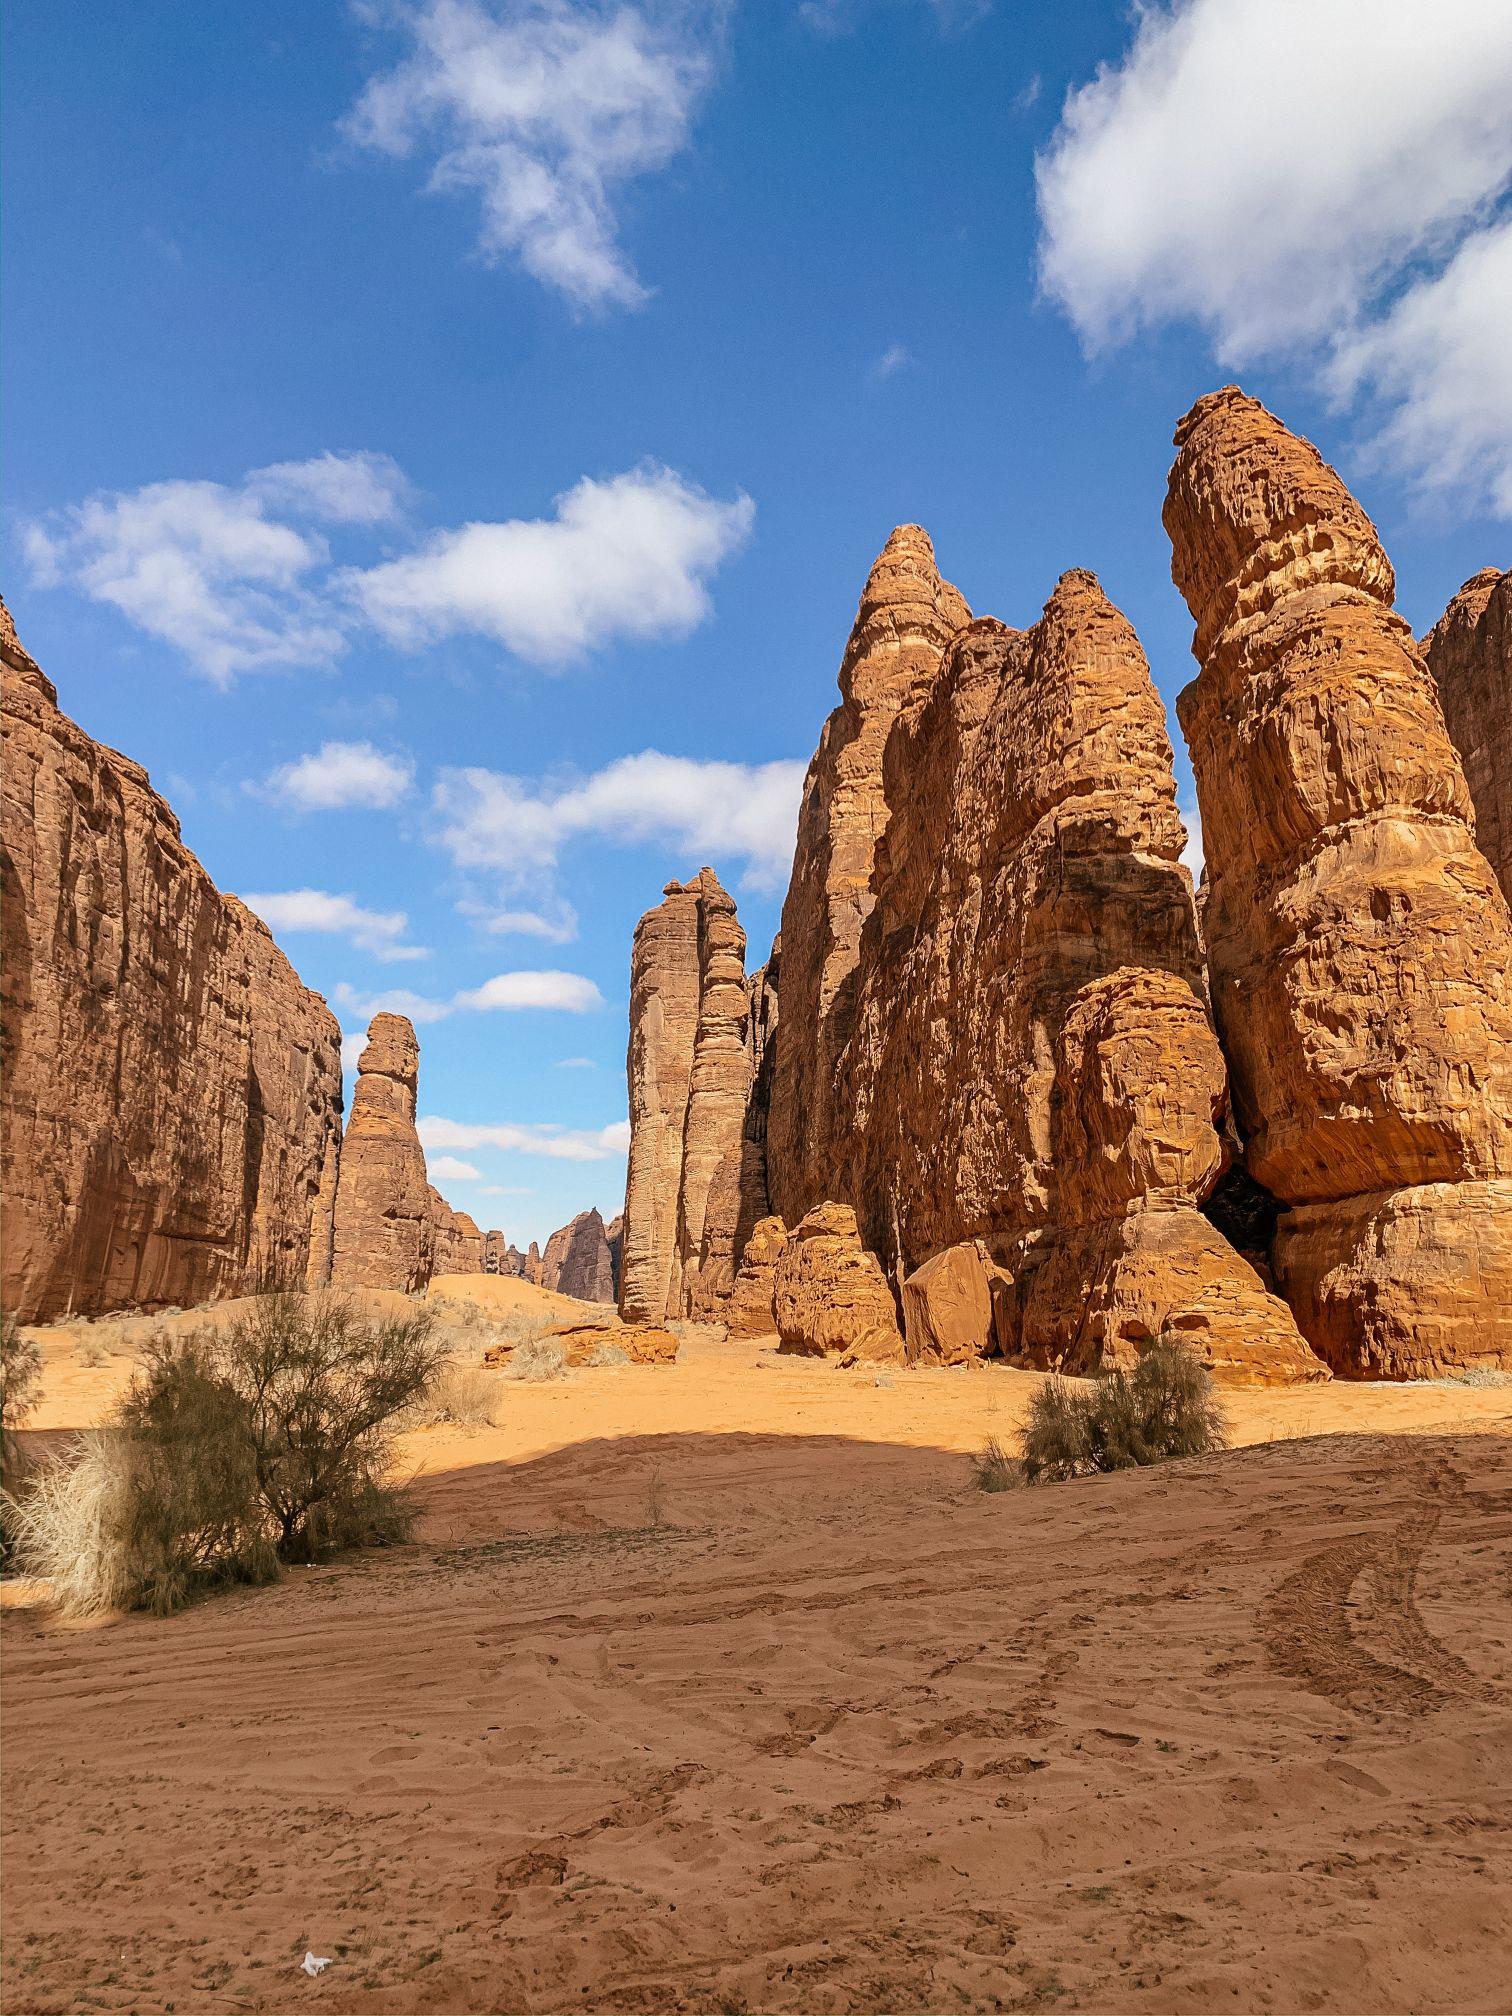 Desert in Al Ula Saudi Arabia